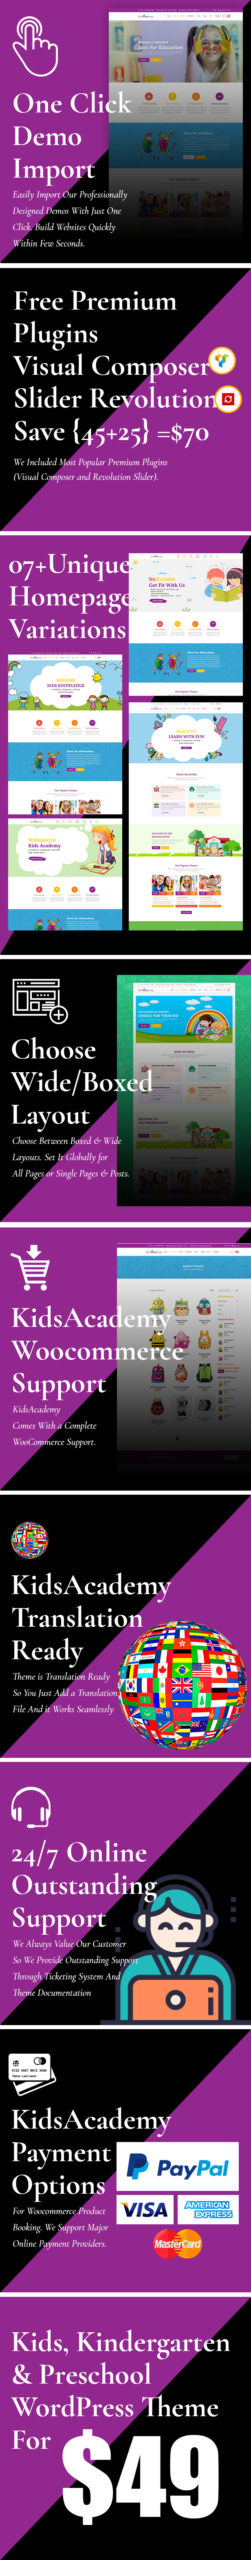 KidsAcademy - Kids, Kindergarten & Preschool WordPress Theme v.1.3.4